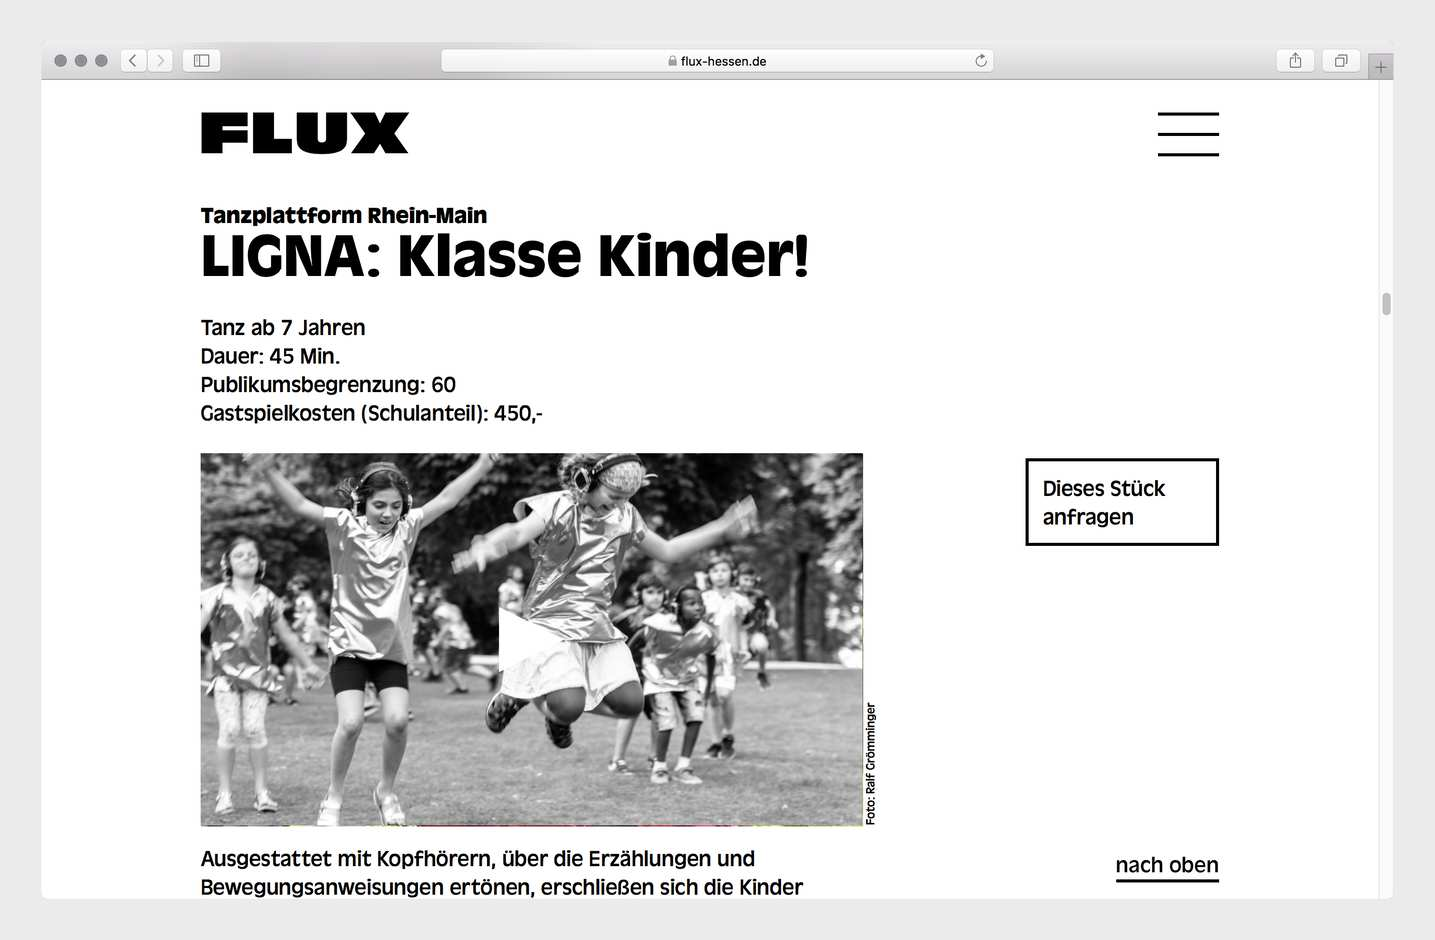 flux-website-9-1435x940px